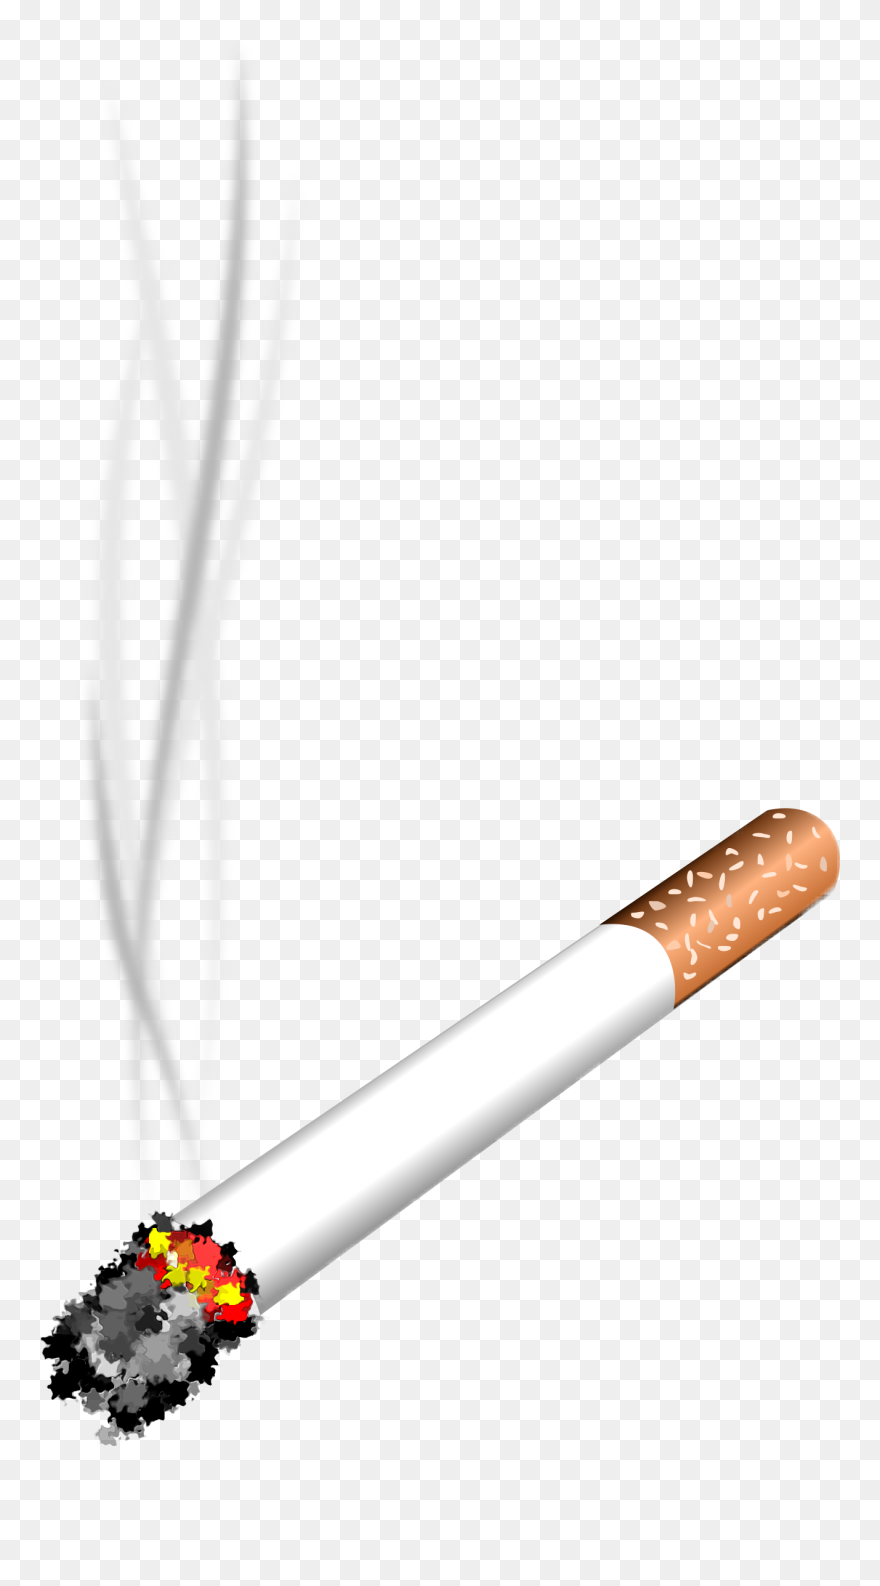 Smoke cigarette. Vector royalty free clipart